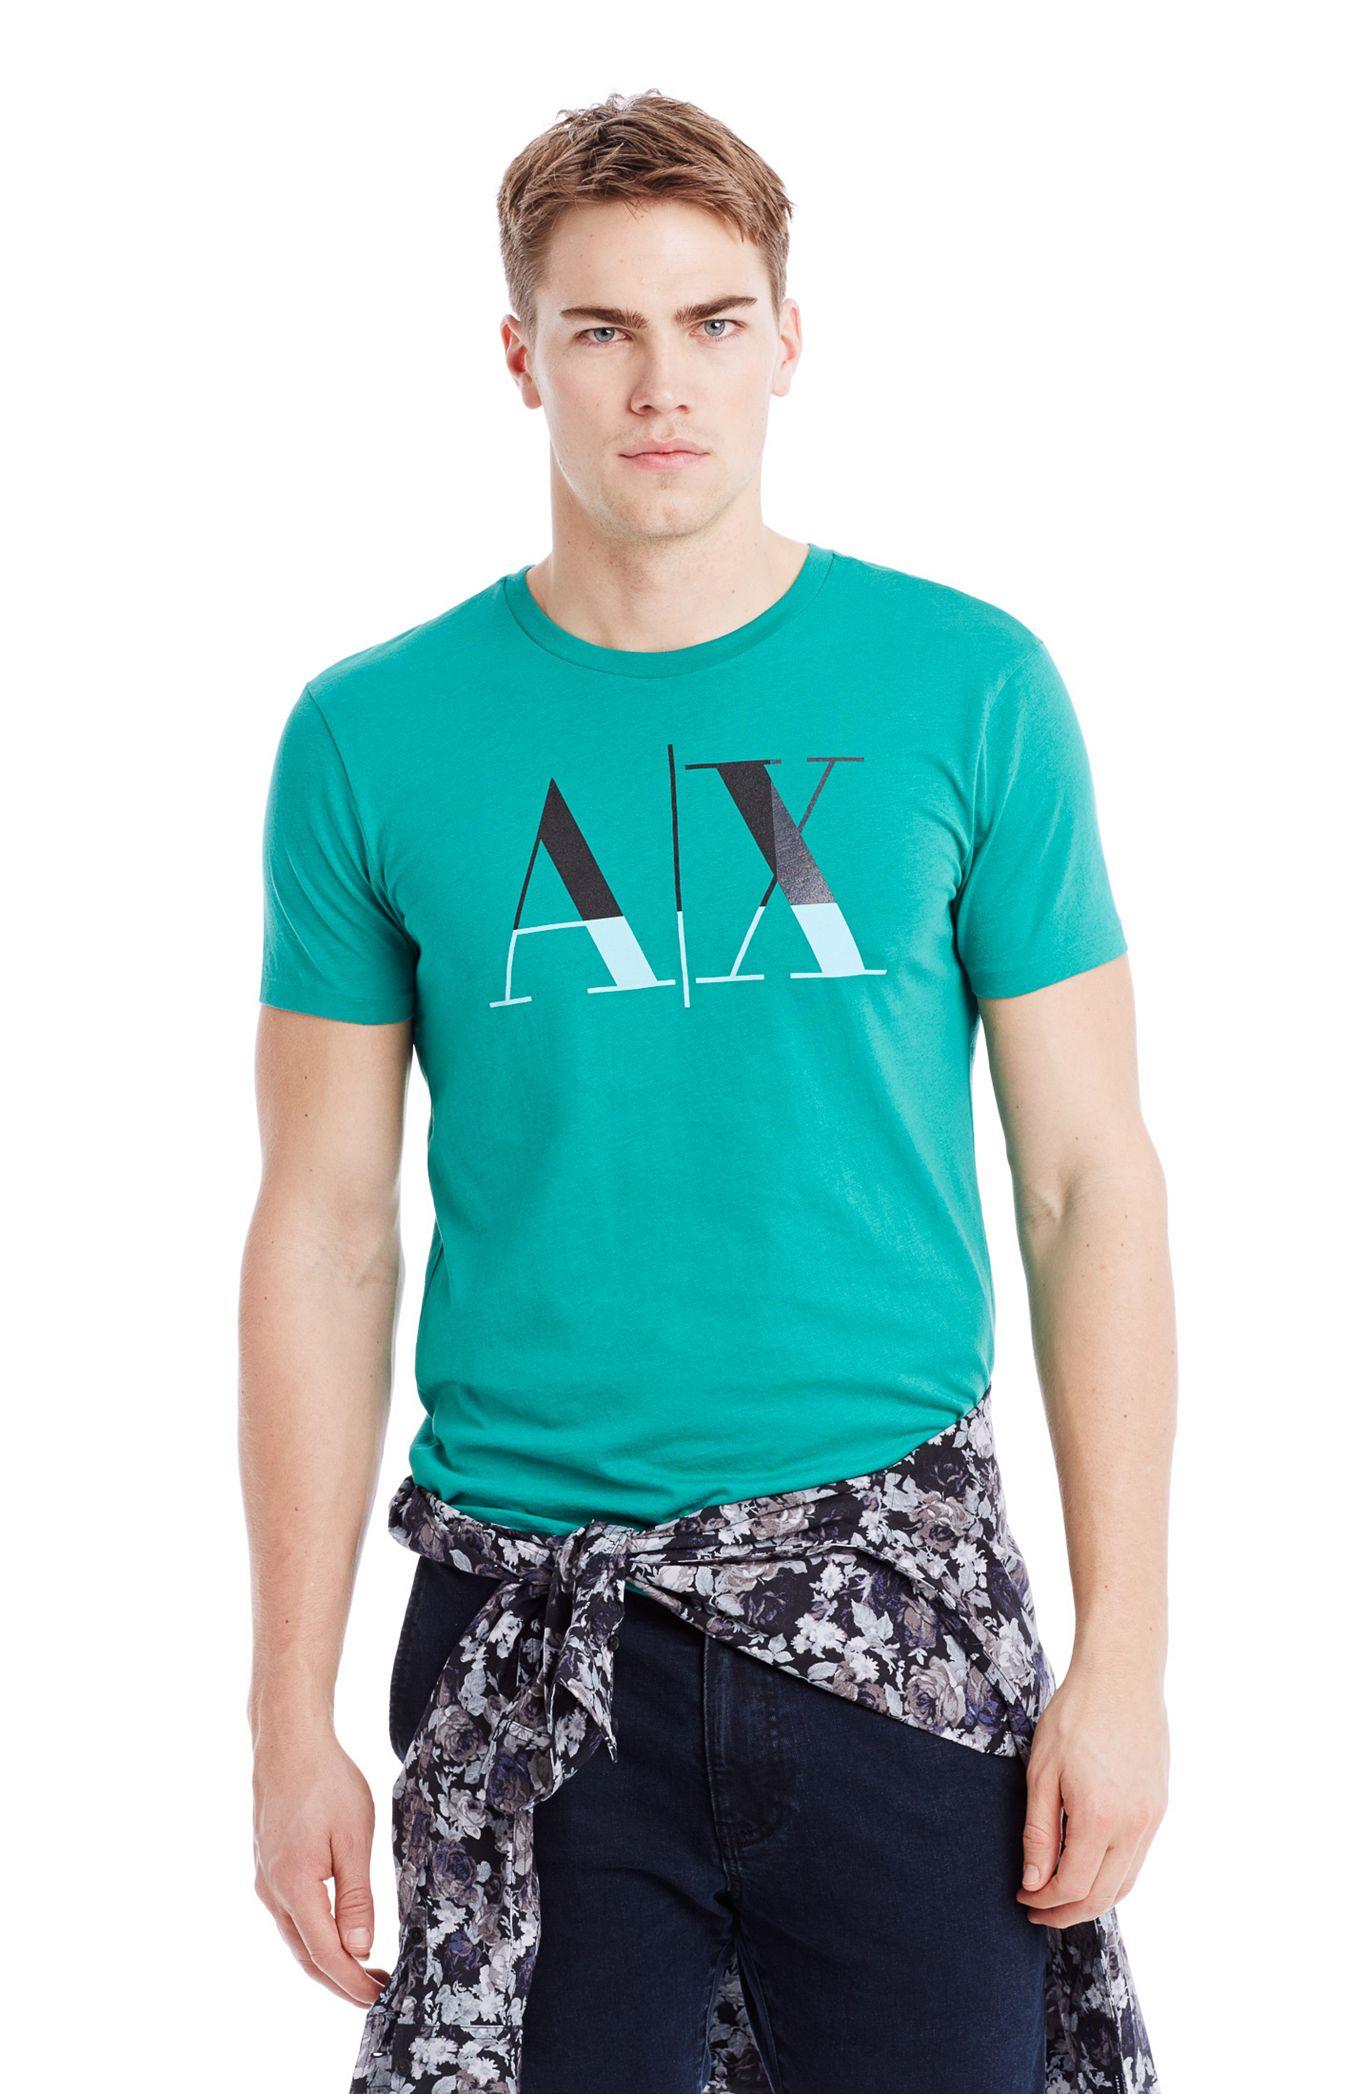 Футболка мужская Armani  2015 AX Exchange 10 женская рубашка armani 85 ax 2015 j5c552